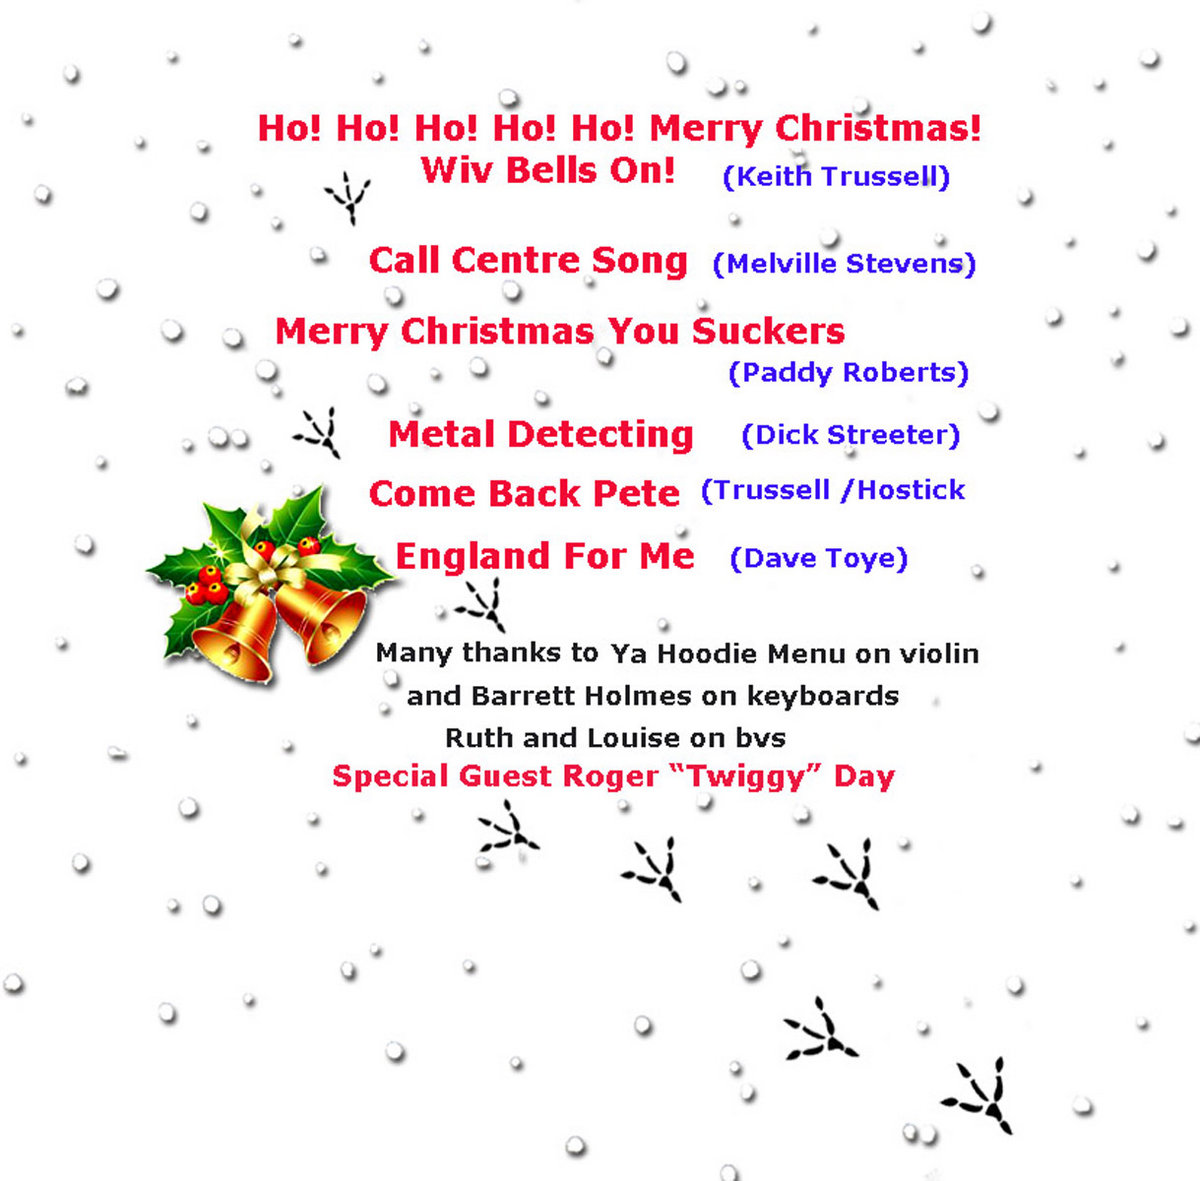 Process audio 203 ho ho ho merry christmas mp3 download b6ny. Com.